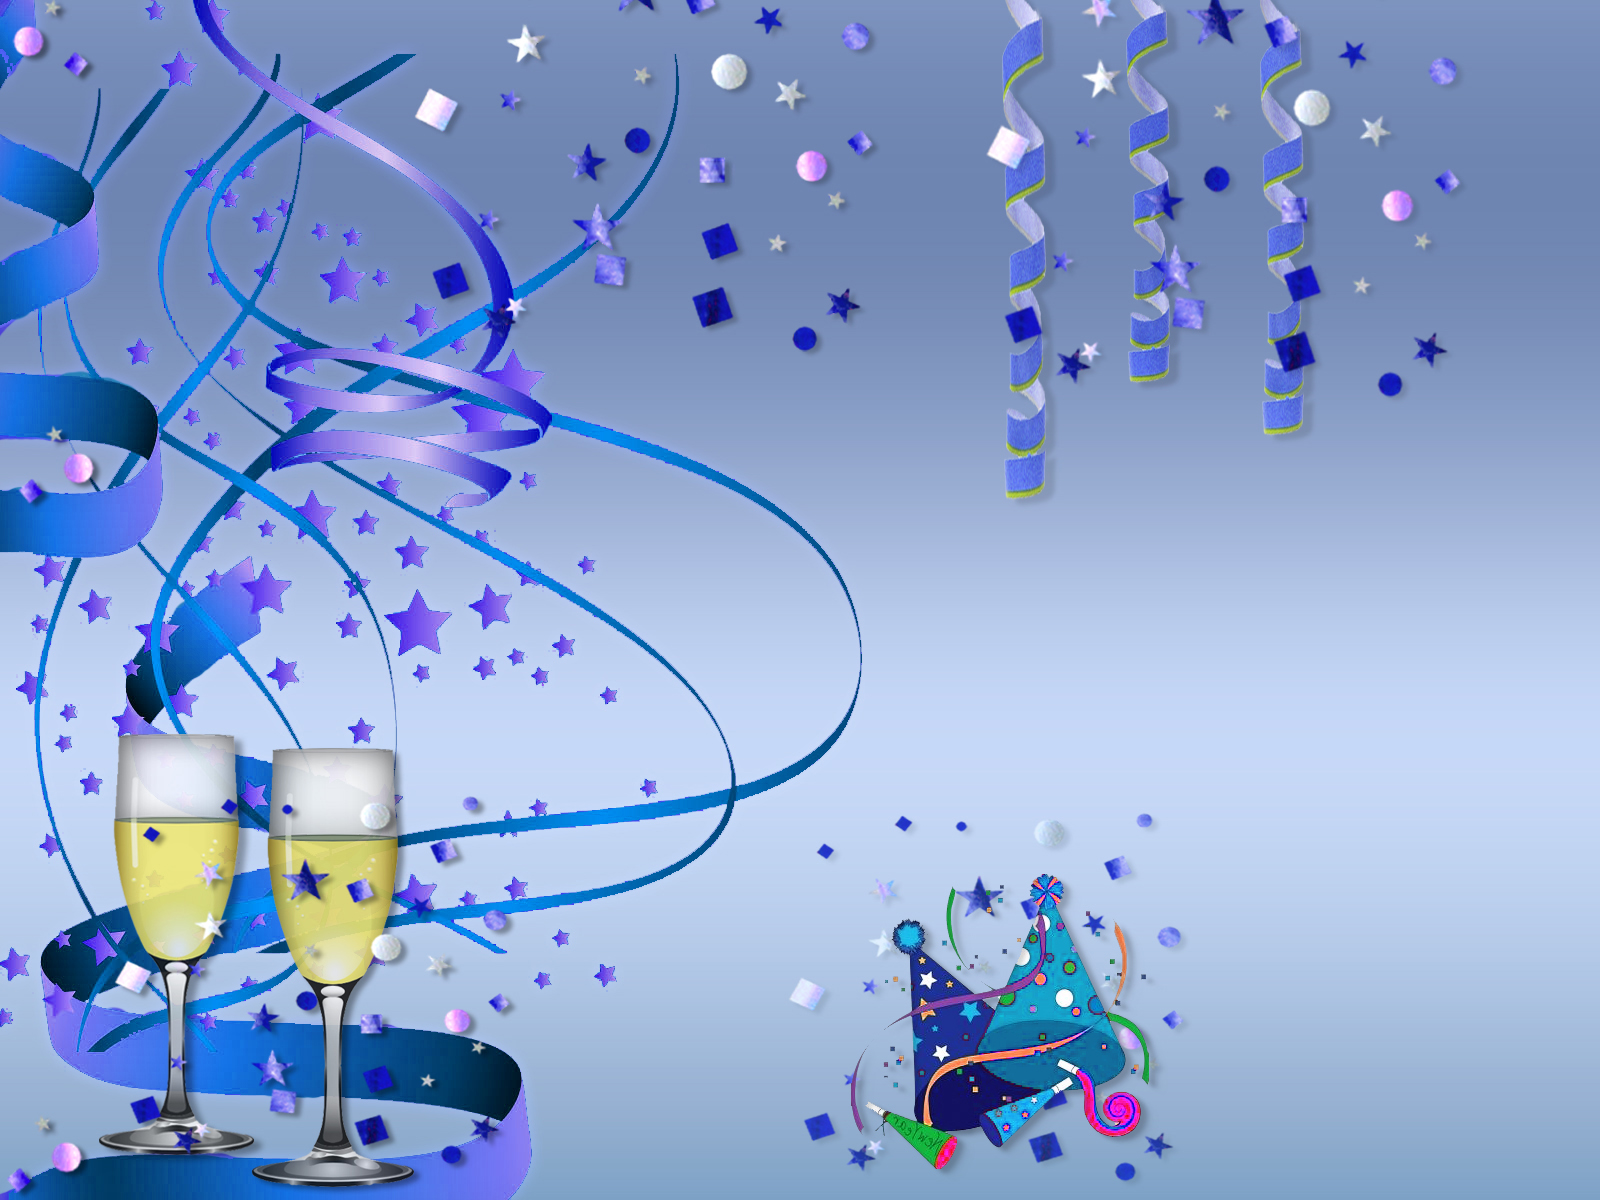 happy new year wallpaper 2013